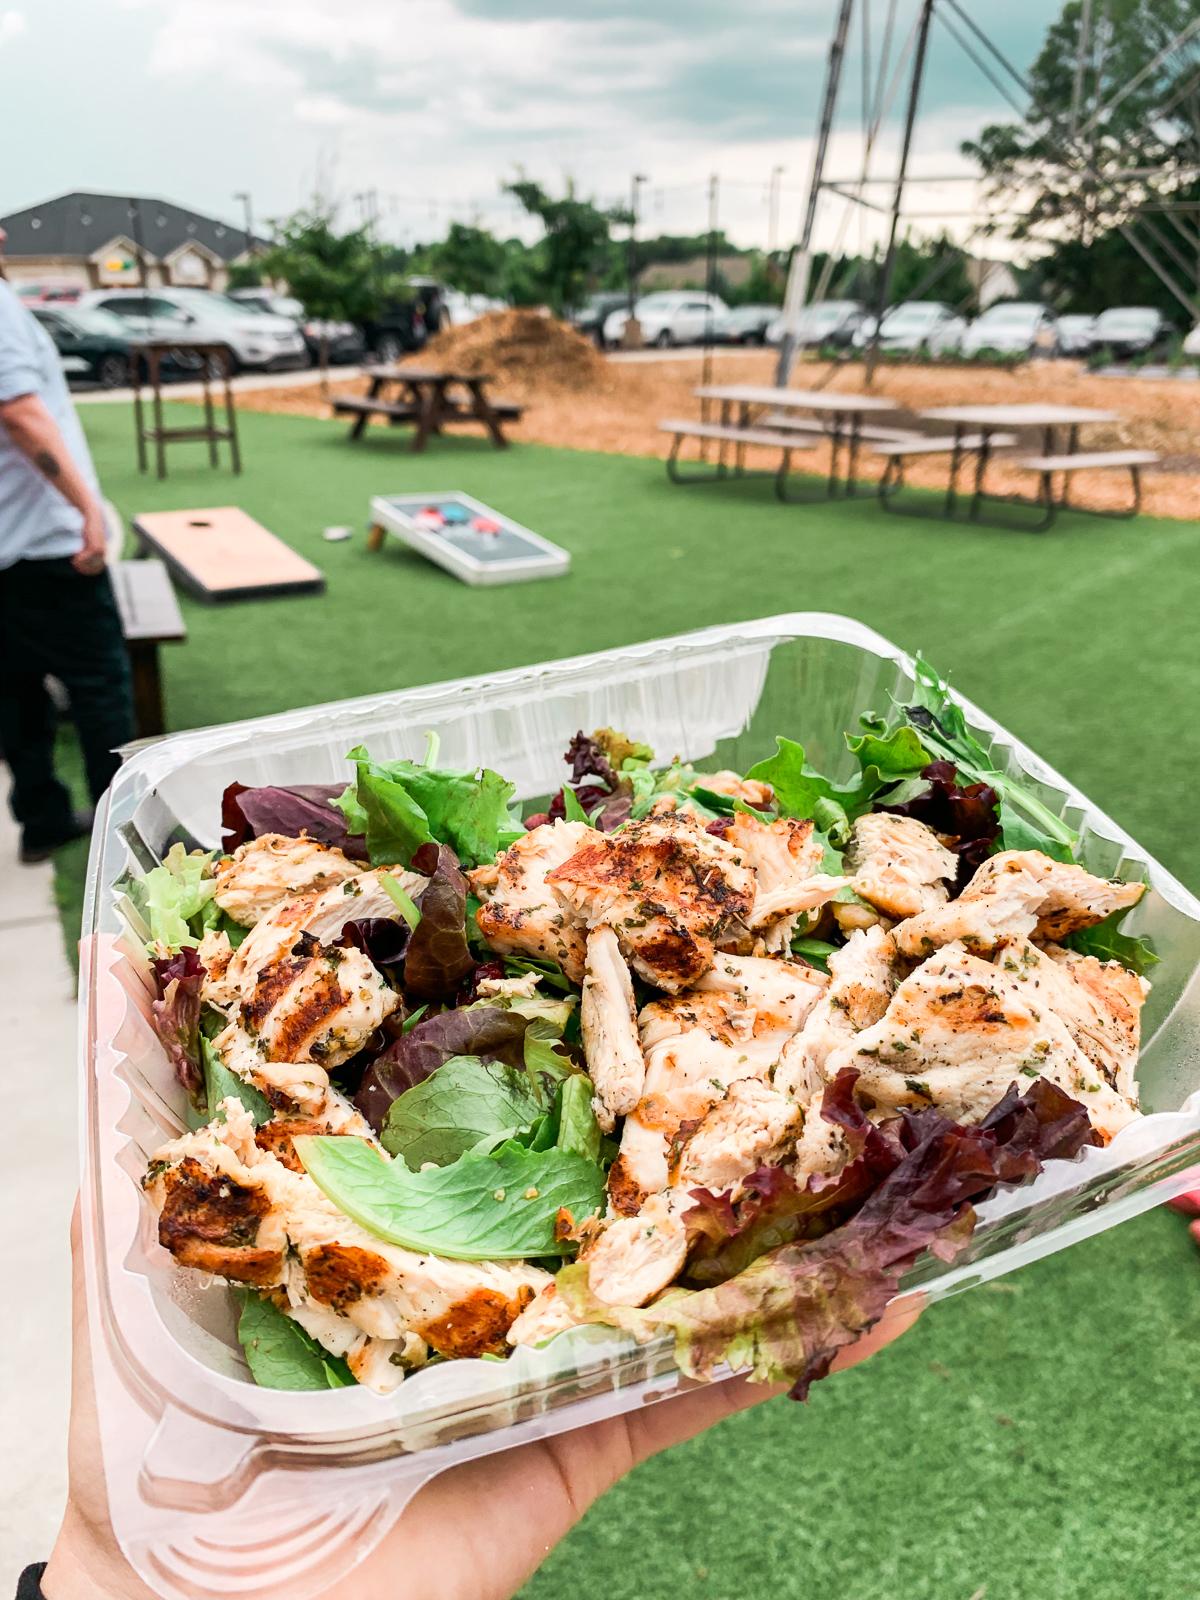 Marios, dinner, Italian, Charlotte, salad, grilled chicken, gluten free, healthy, food,